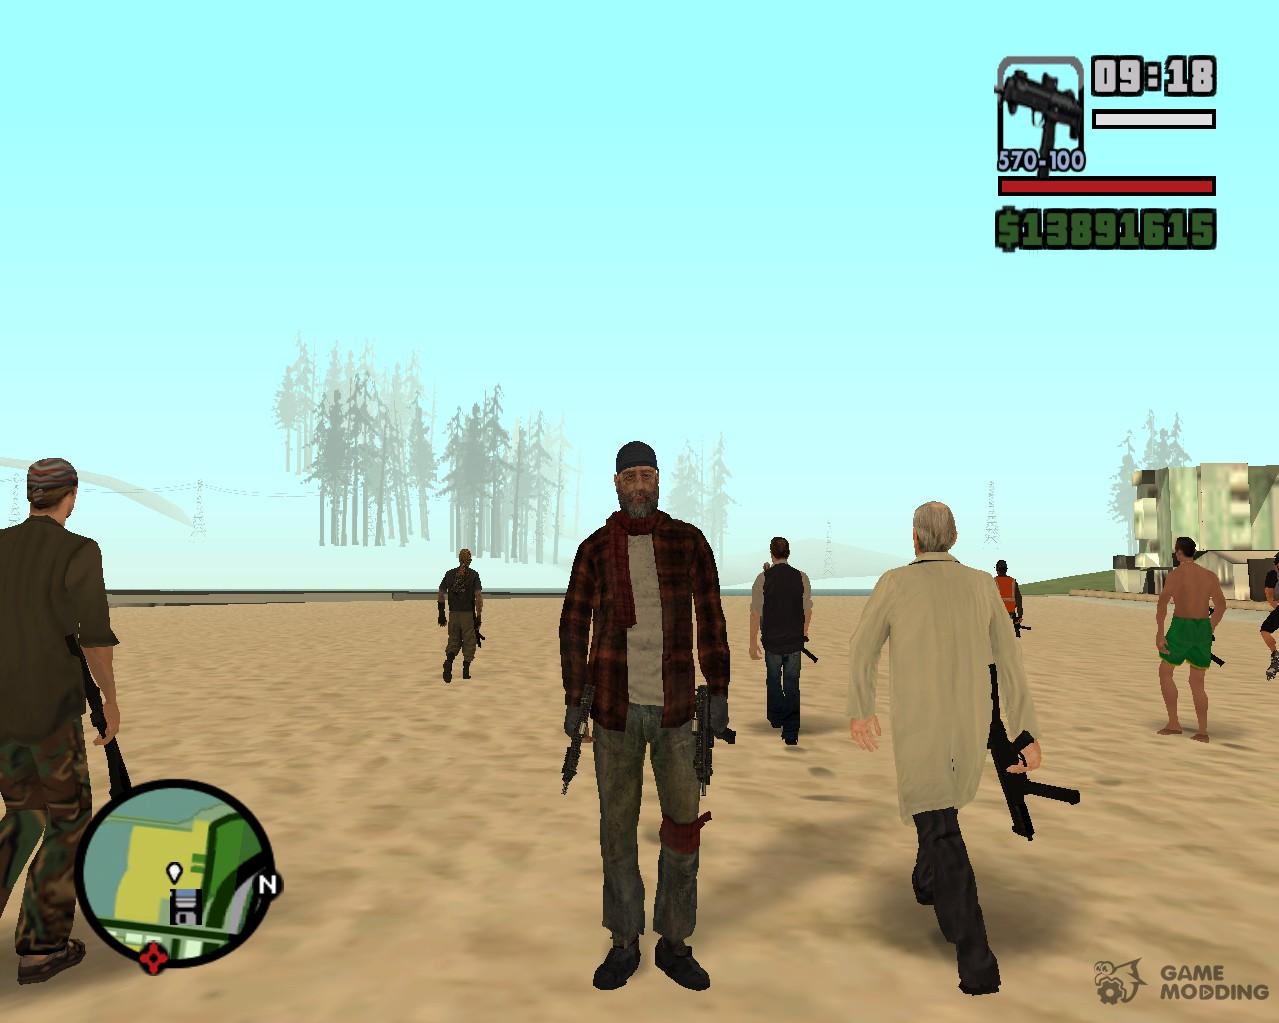 Коды к GTA: San Andreas: Все коды 99